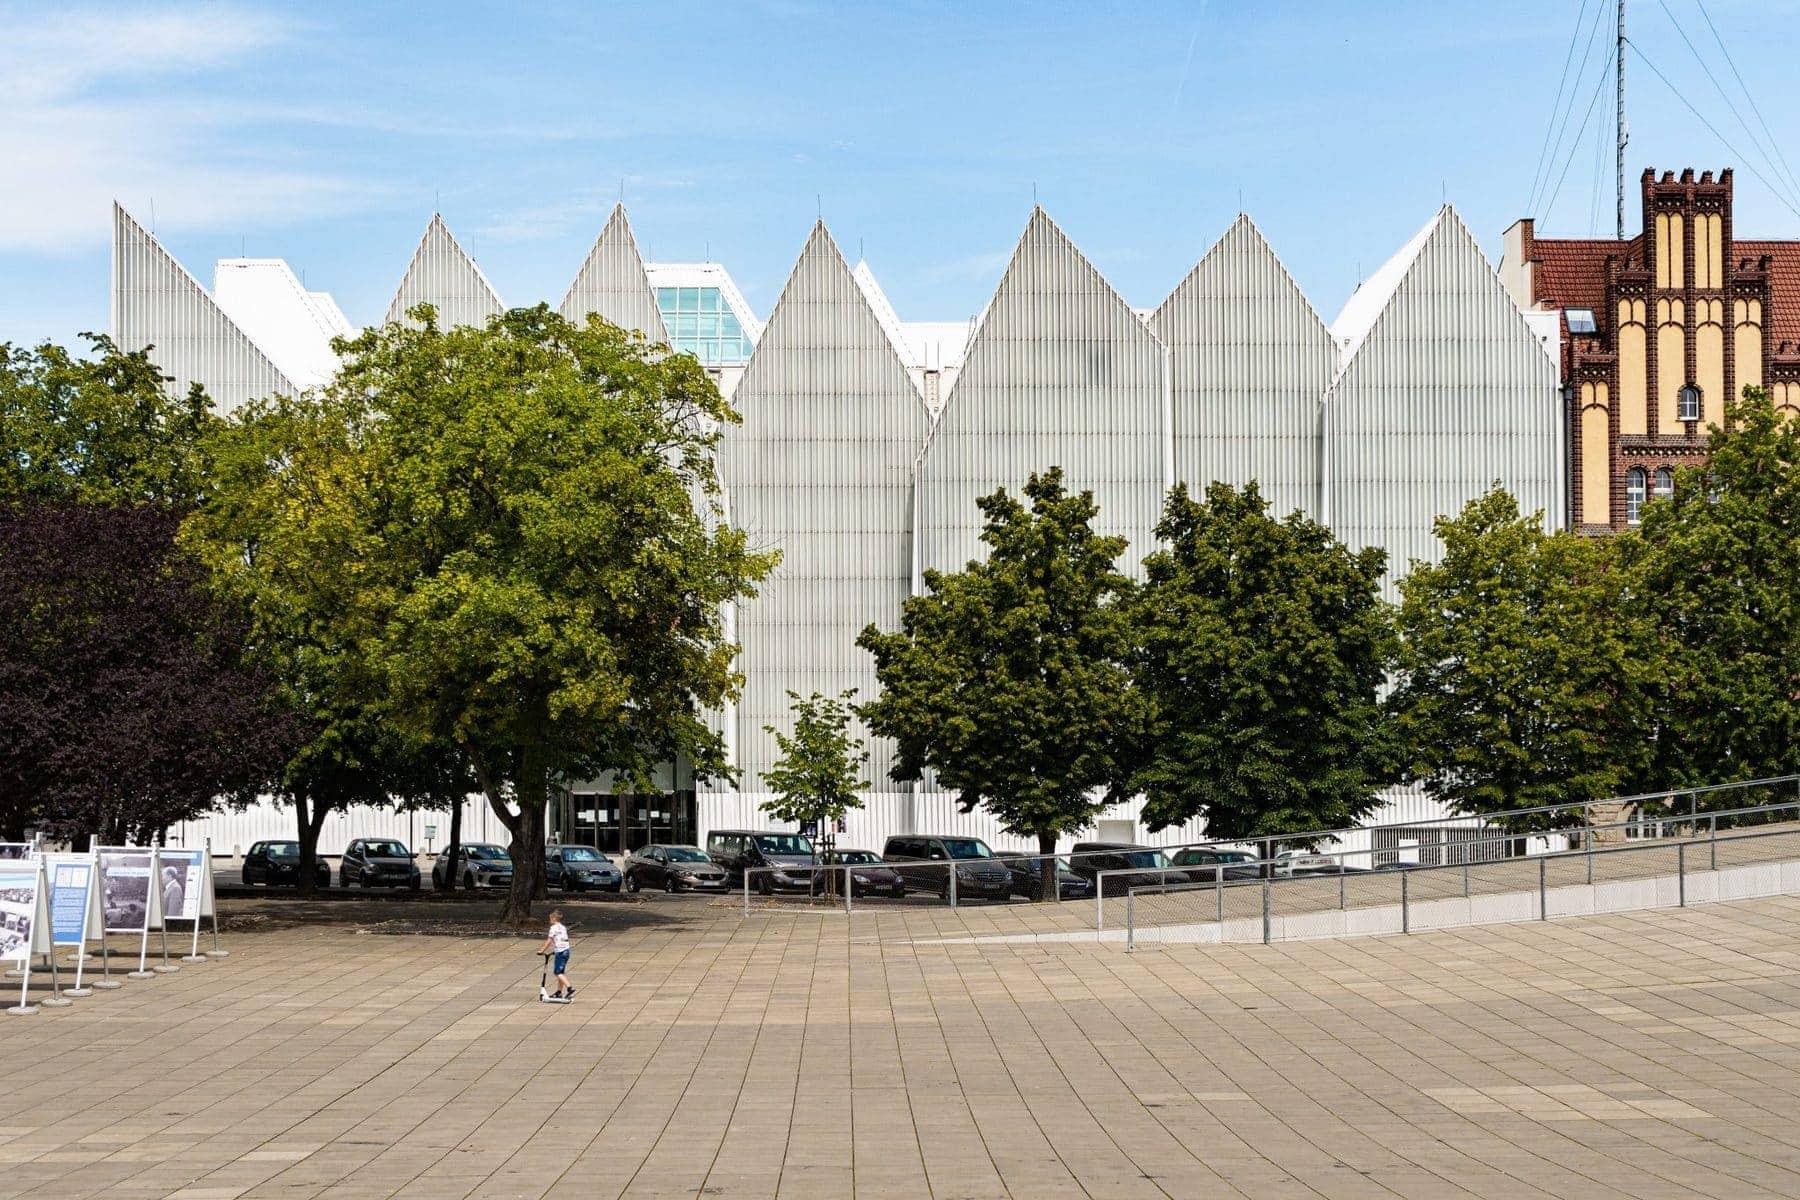 Philharmonic Hall Szczecin 6, 2019